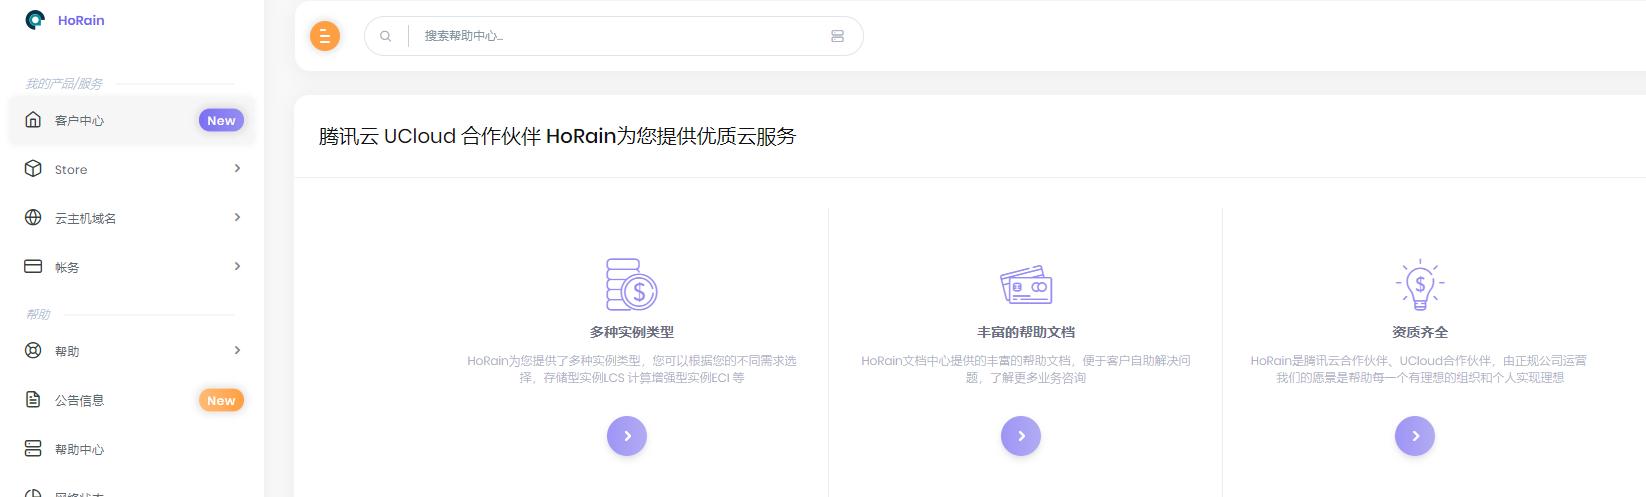 HoRain Cloud:美国便宜VPS,2核4G每月仅需78元/月